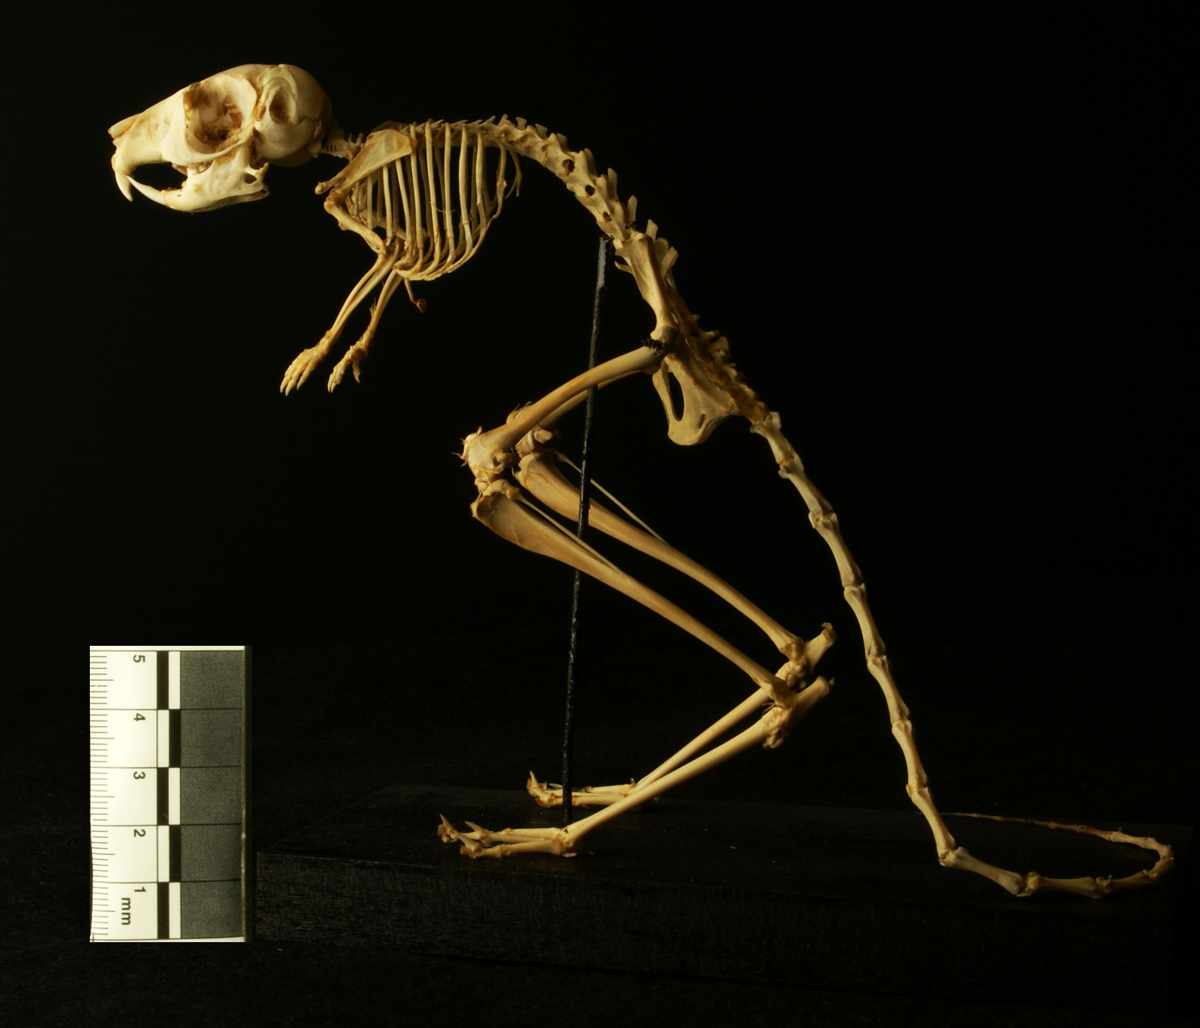 Aardvark skeleton - photo#25